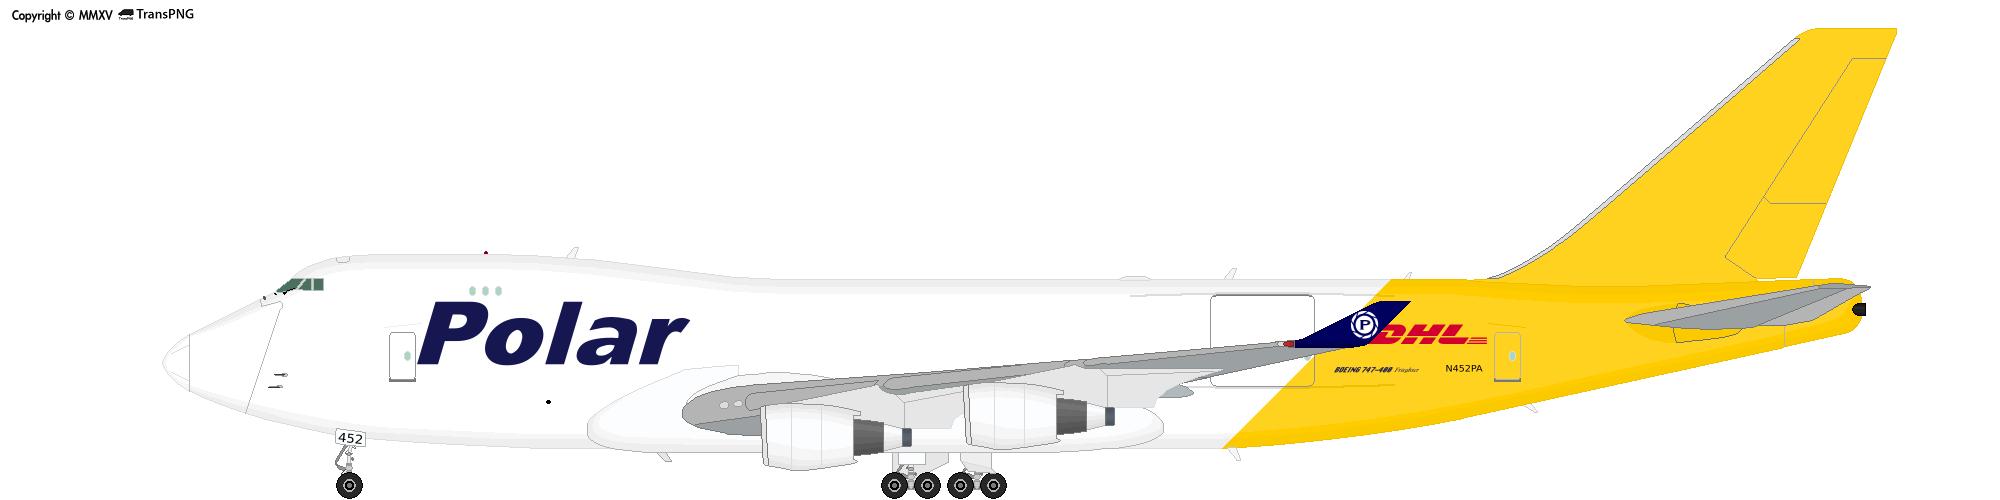 Airplane 6198